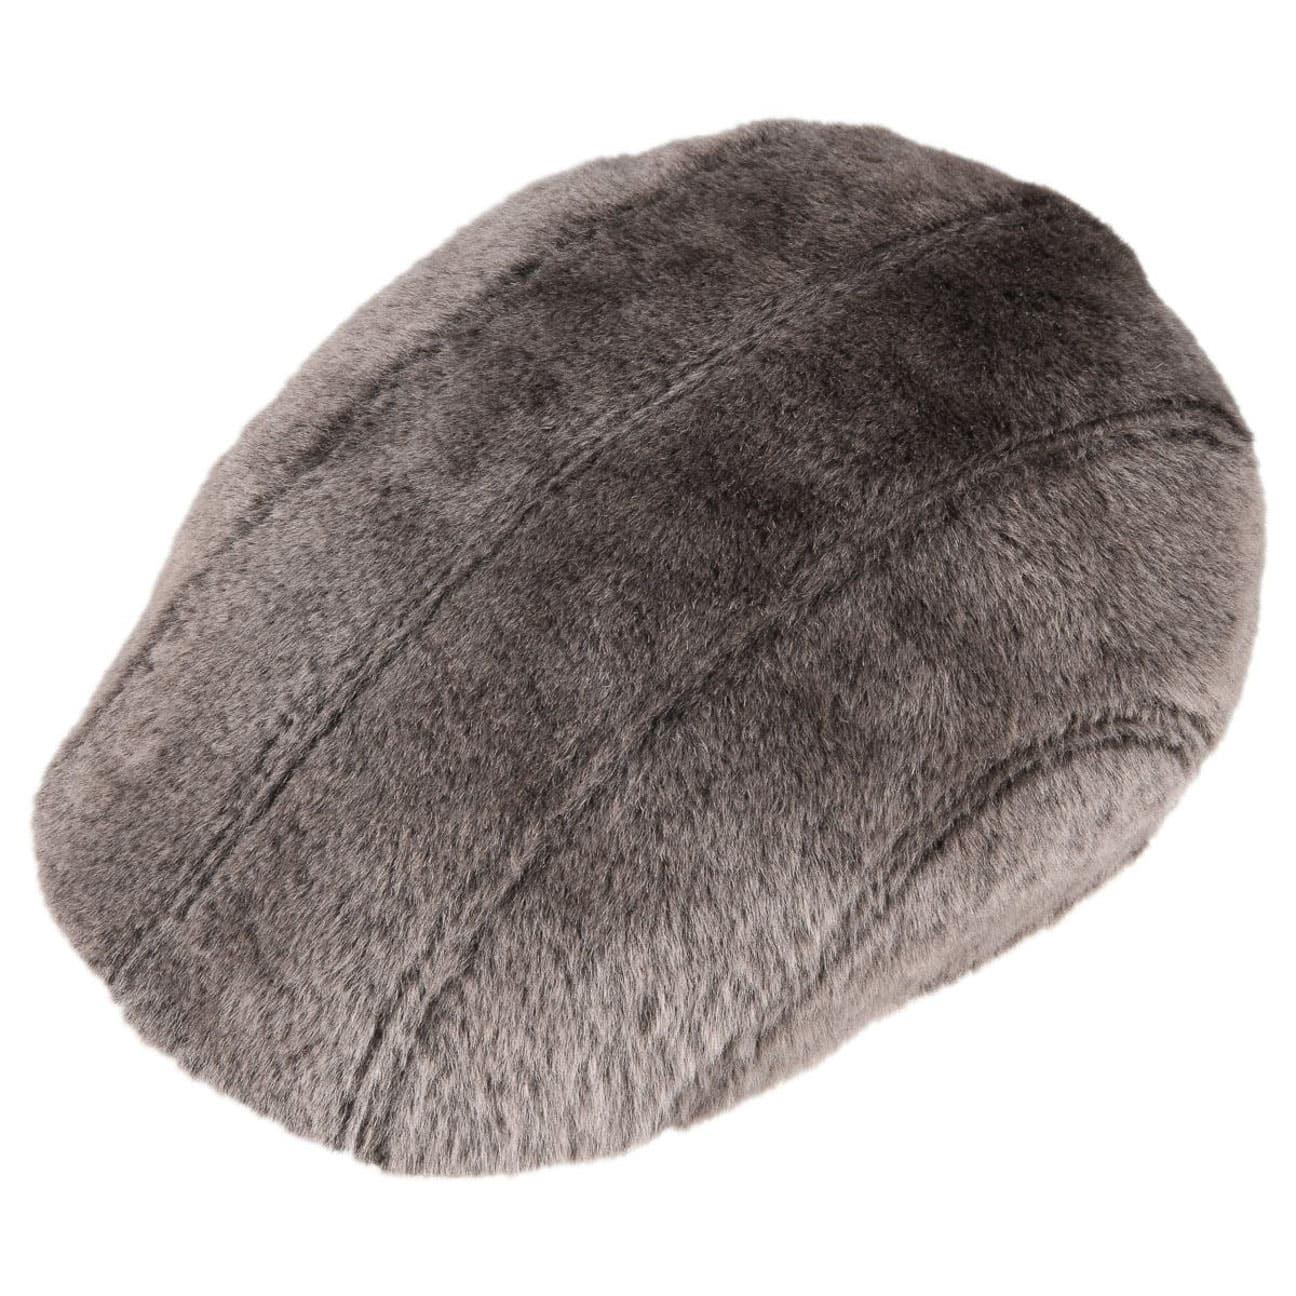 Madison Lamb Fur Flat Cap by Stetson - brown 2 ... 119a184853c2